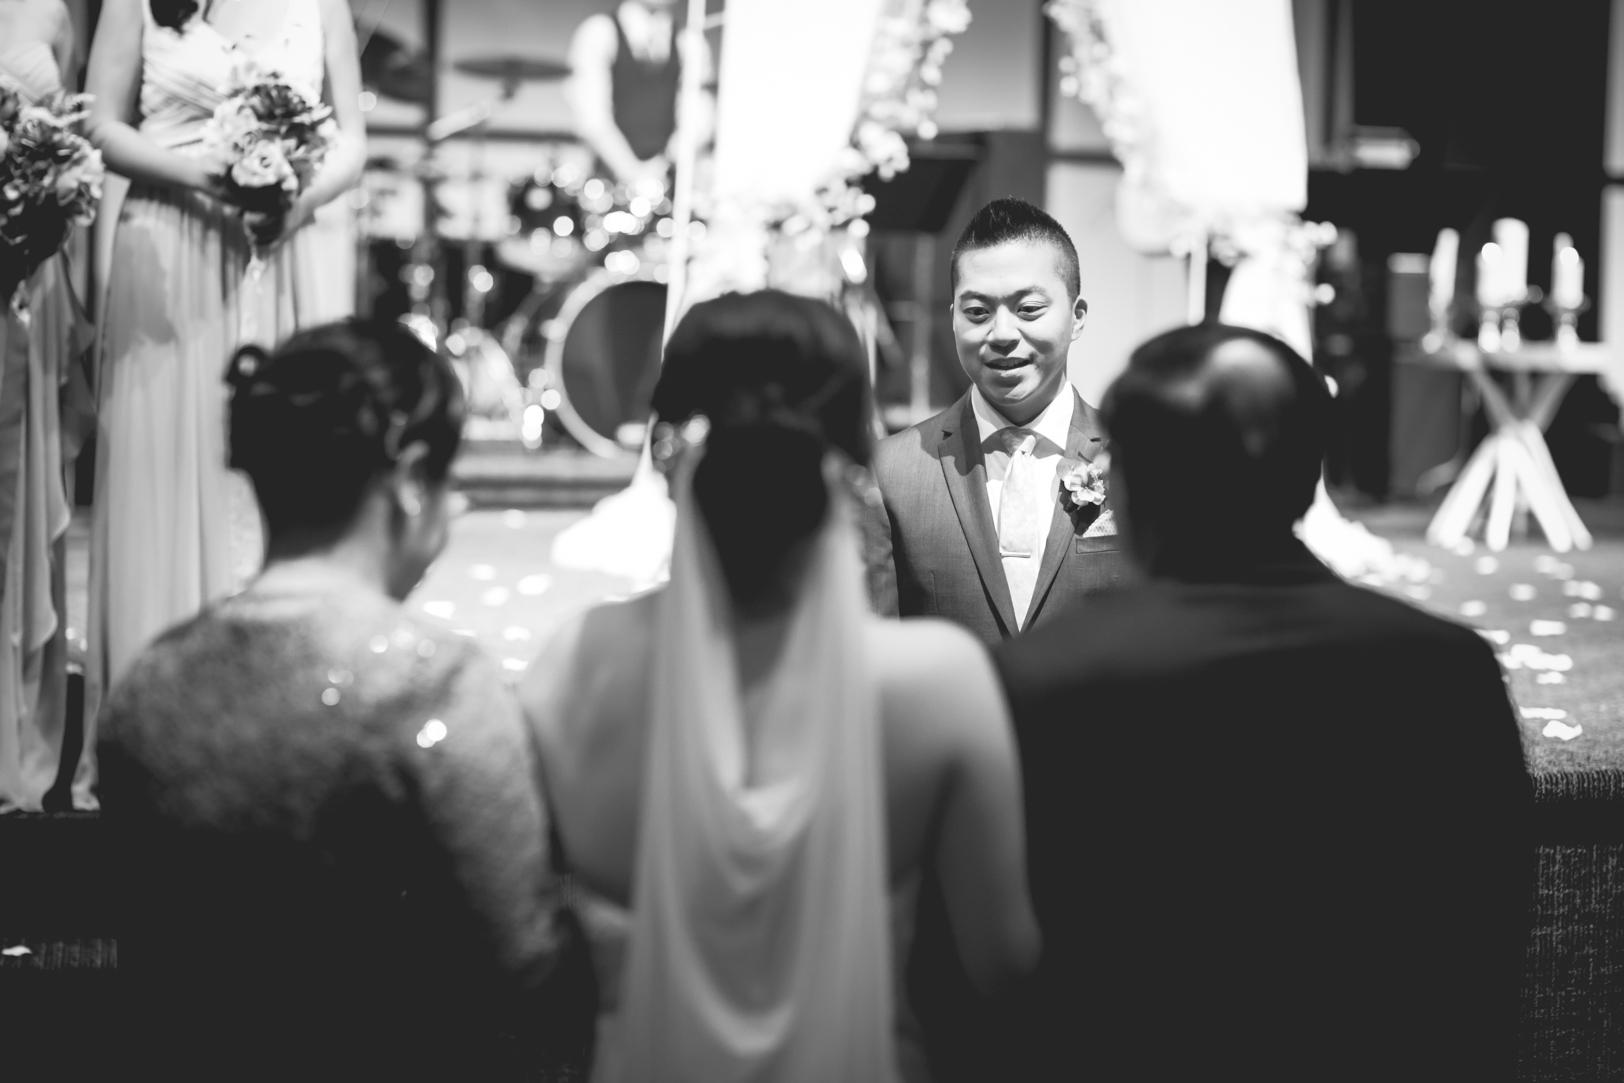 Candid Wedding Ceremony Photos